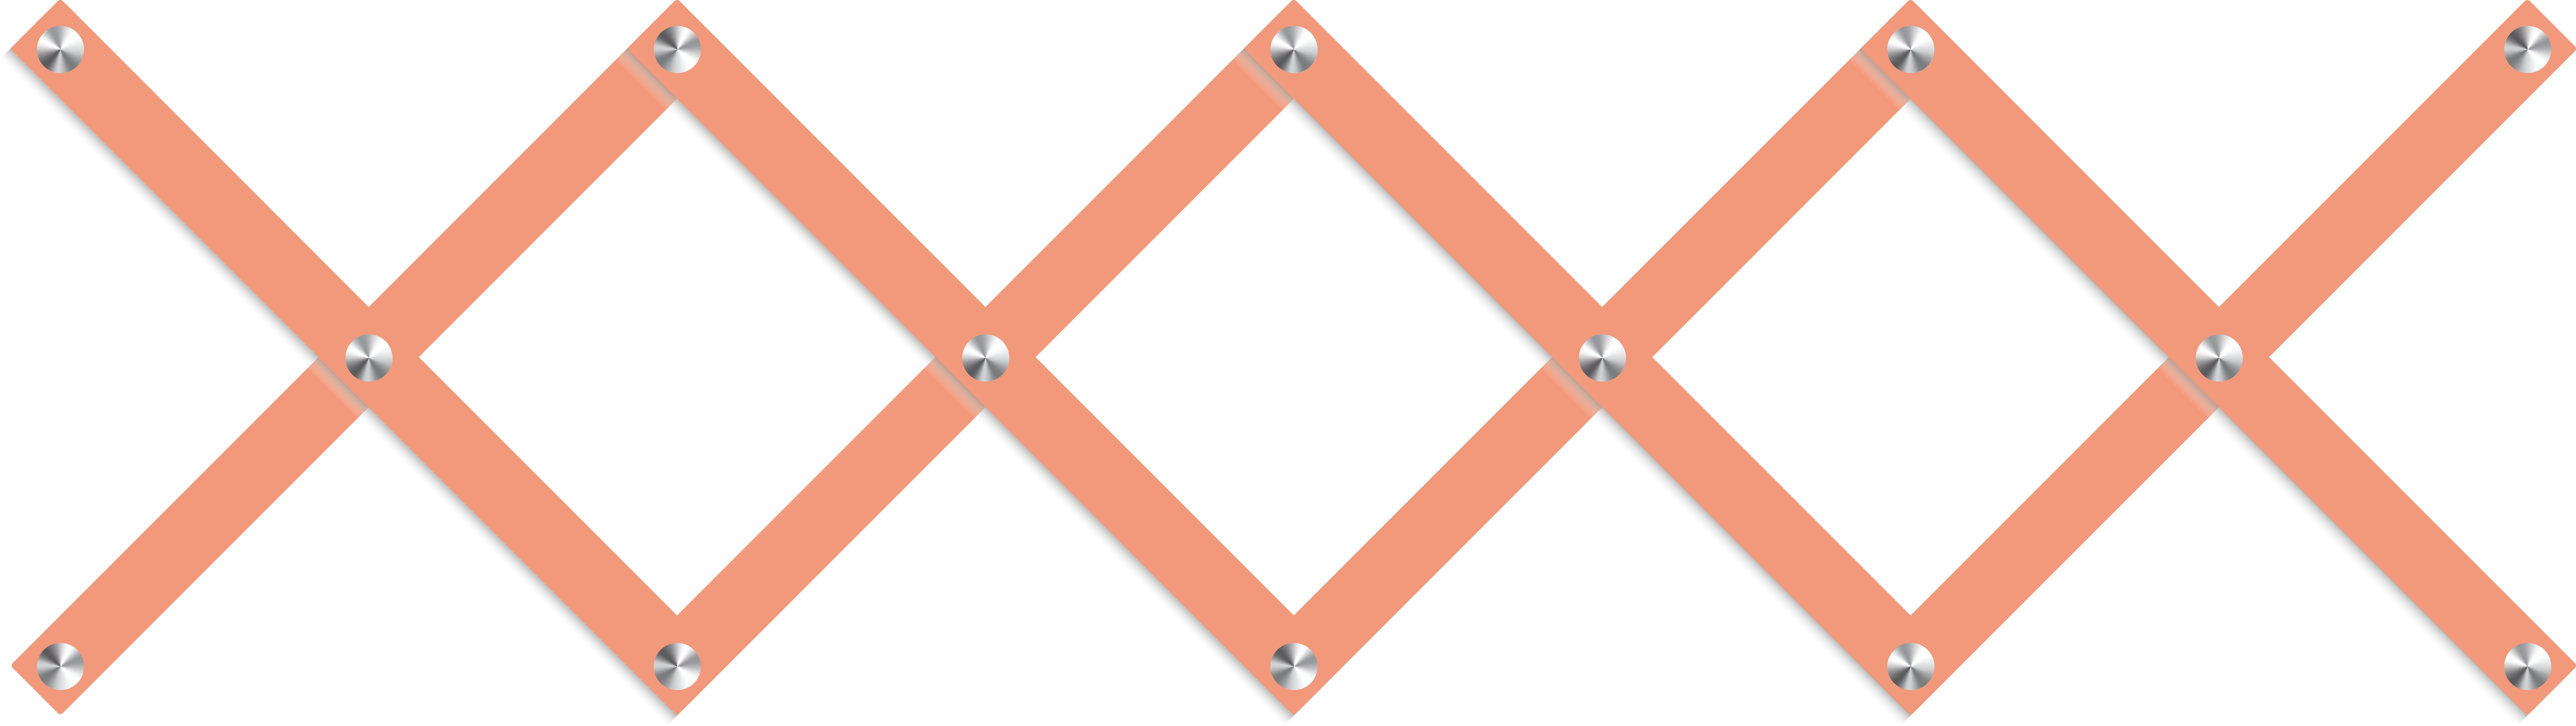 queence Garderobenleiste »Jonas«, 14 Haken & 8 Garderobenleisten kaufen